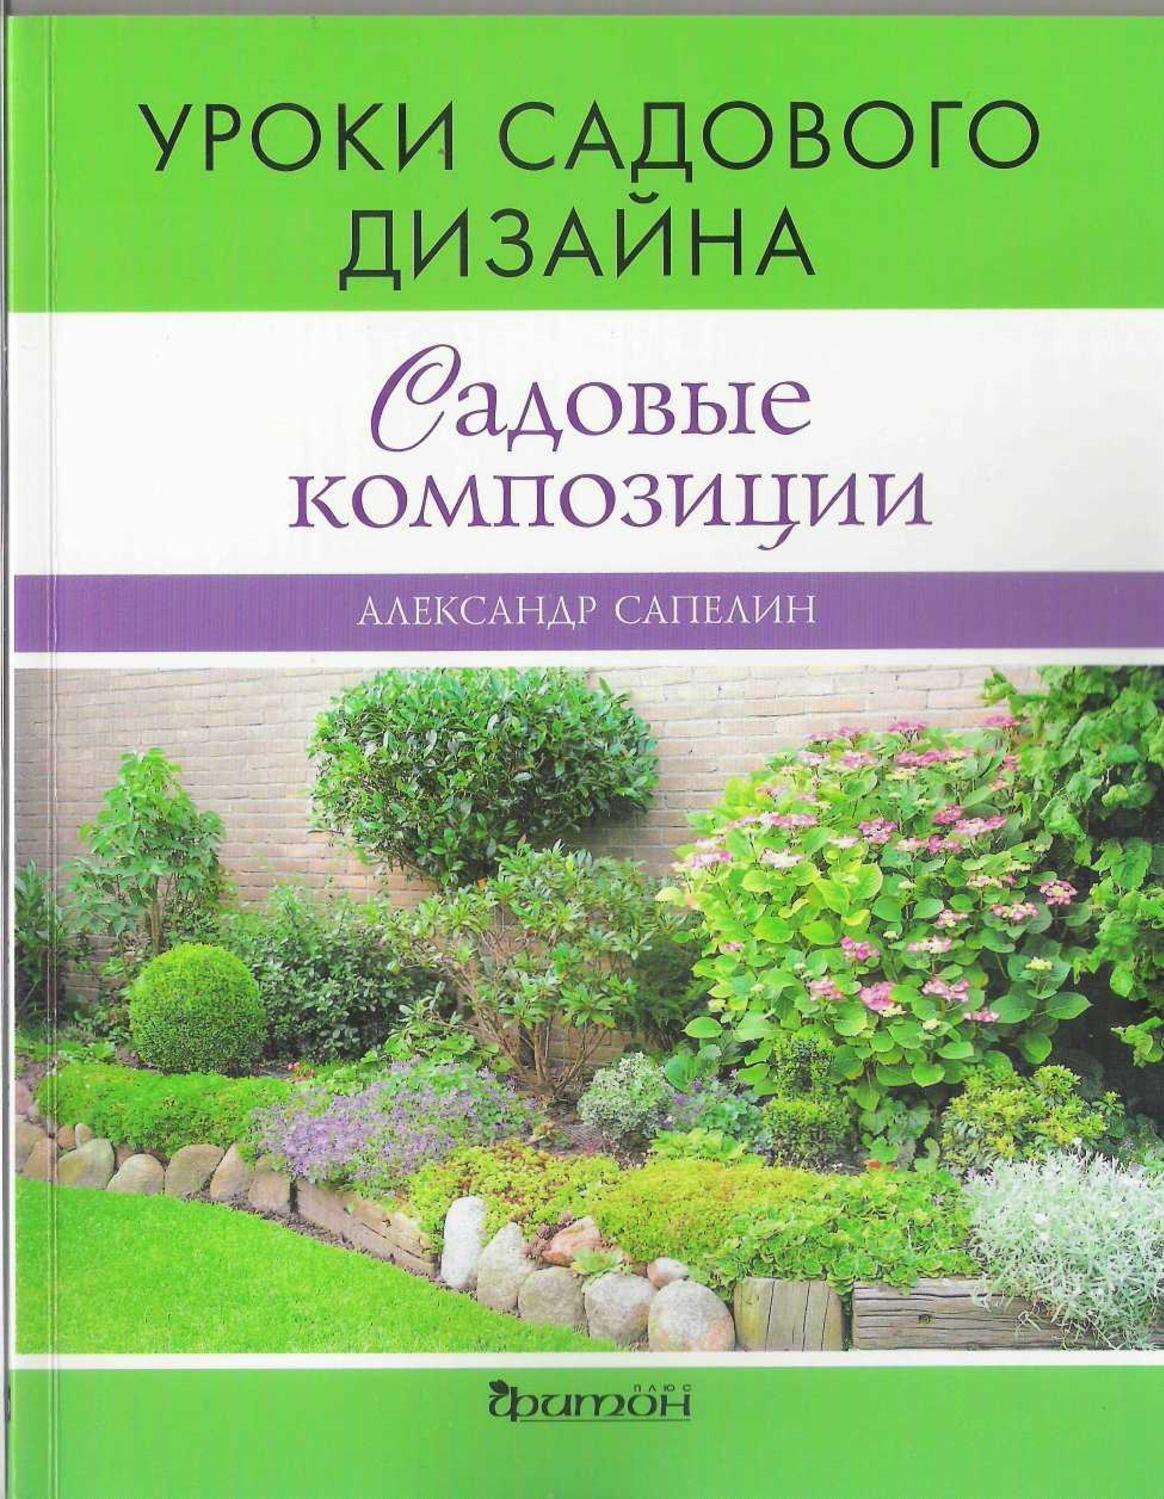 Александр сапелин уроки садового дизайна